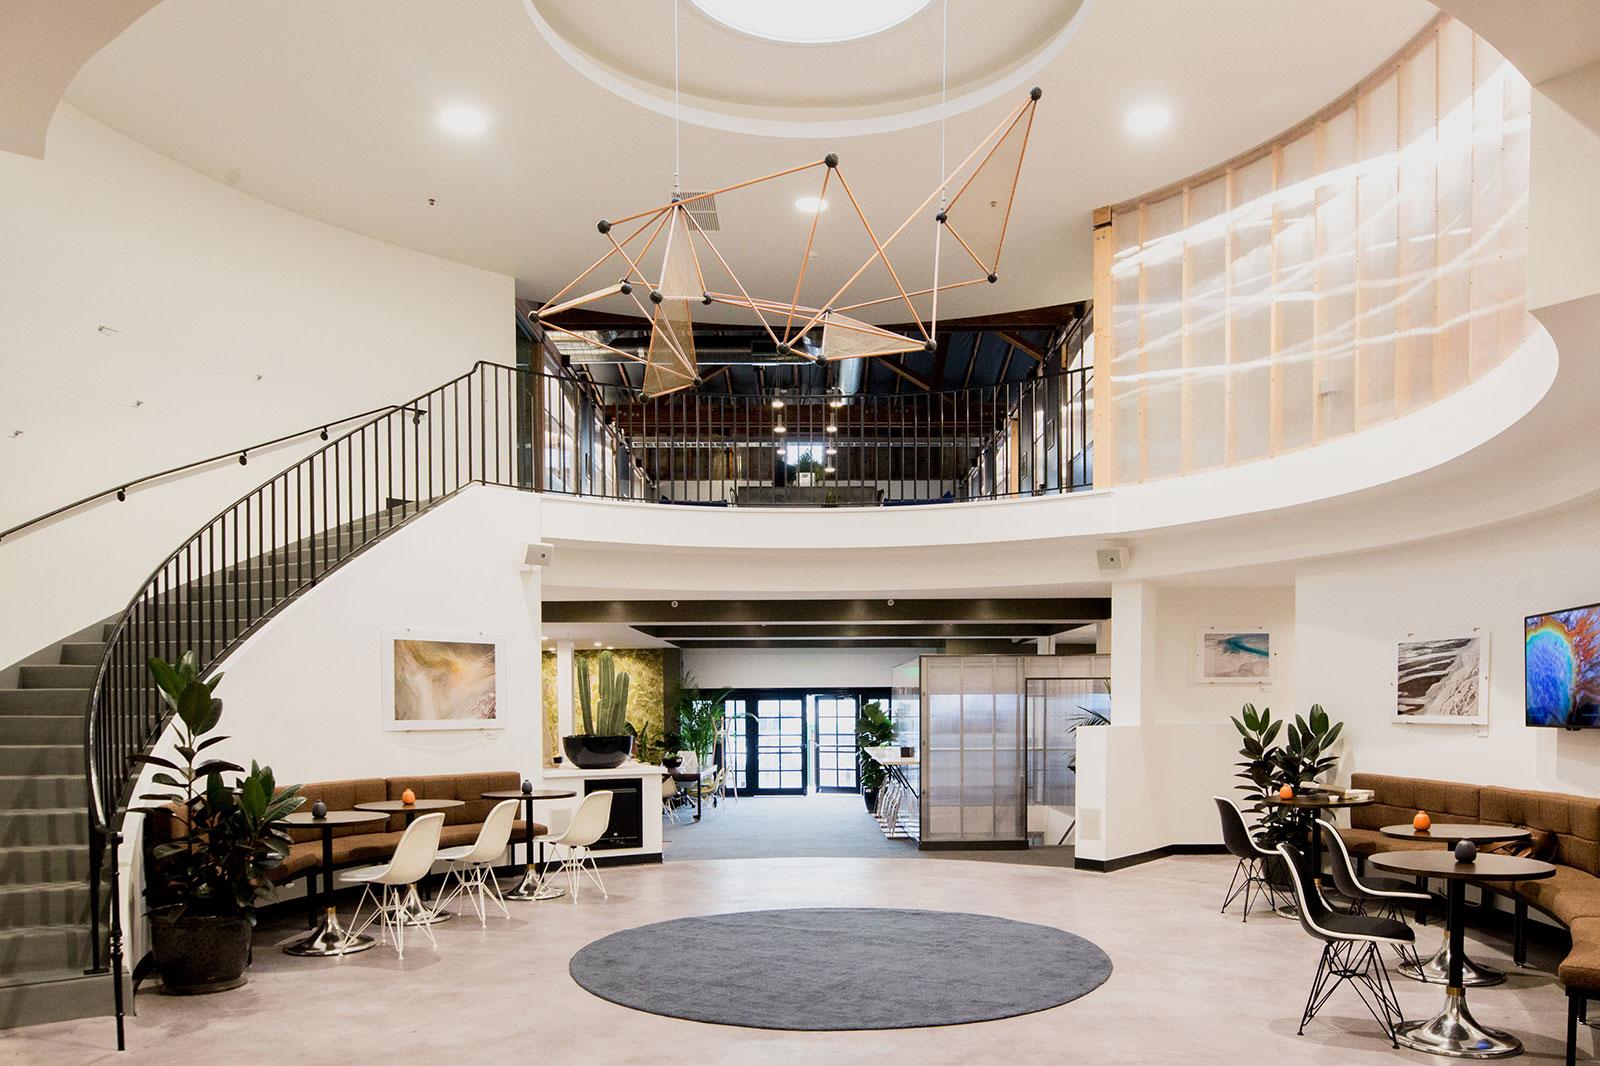 2019 Design Awards Aia Santa Barbara